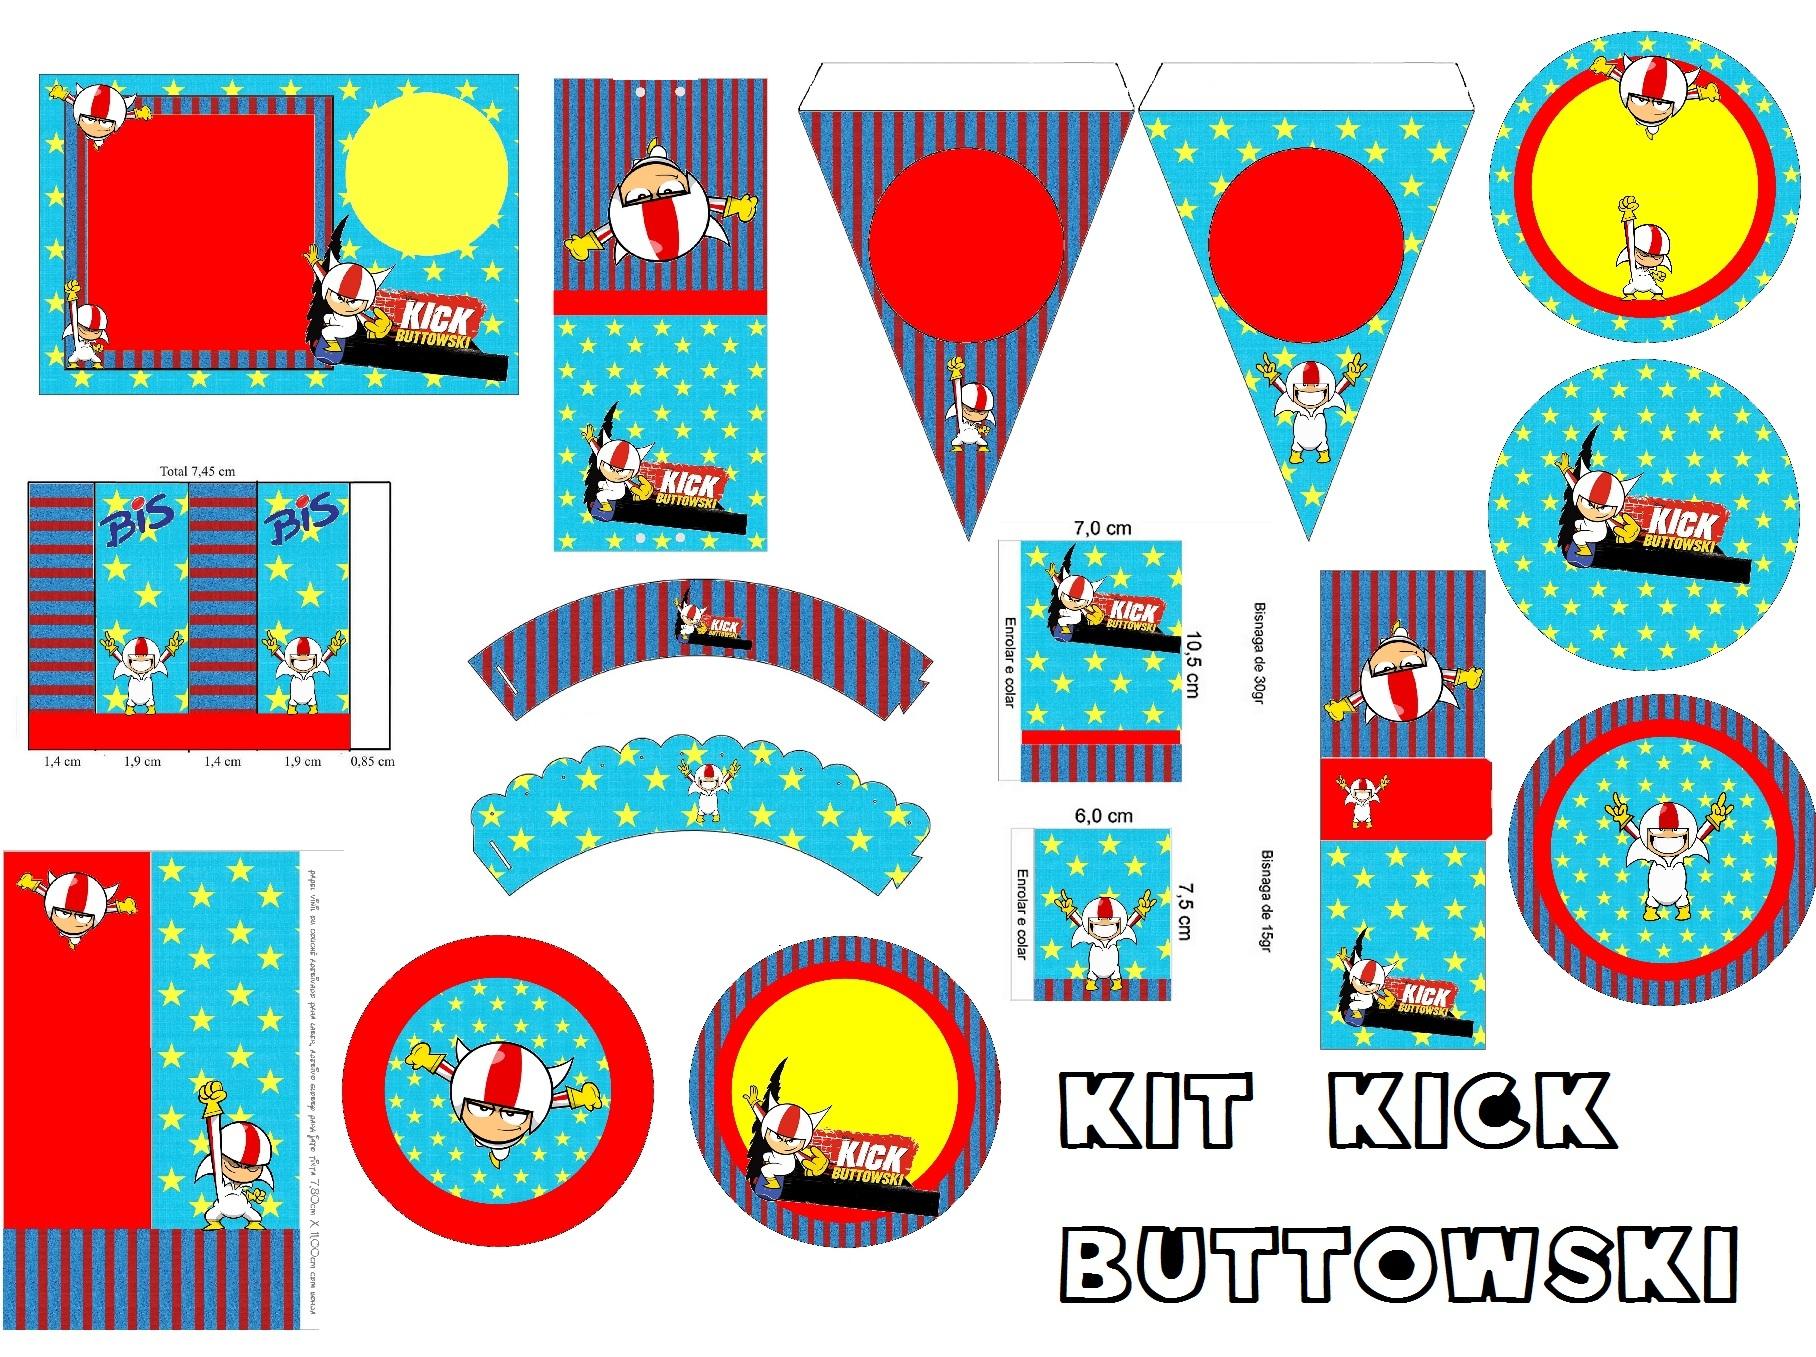 decoracao festa infantil kick buttowski: kick buttowski r $ 0 99 r $ 2 50 revista personalizada kick buttowski